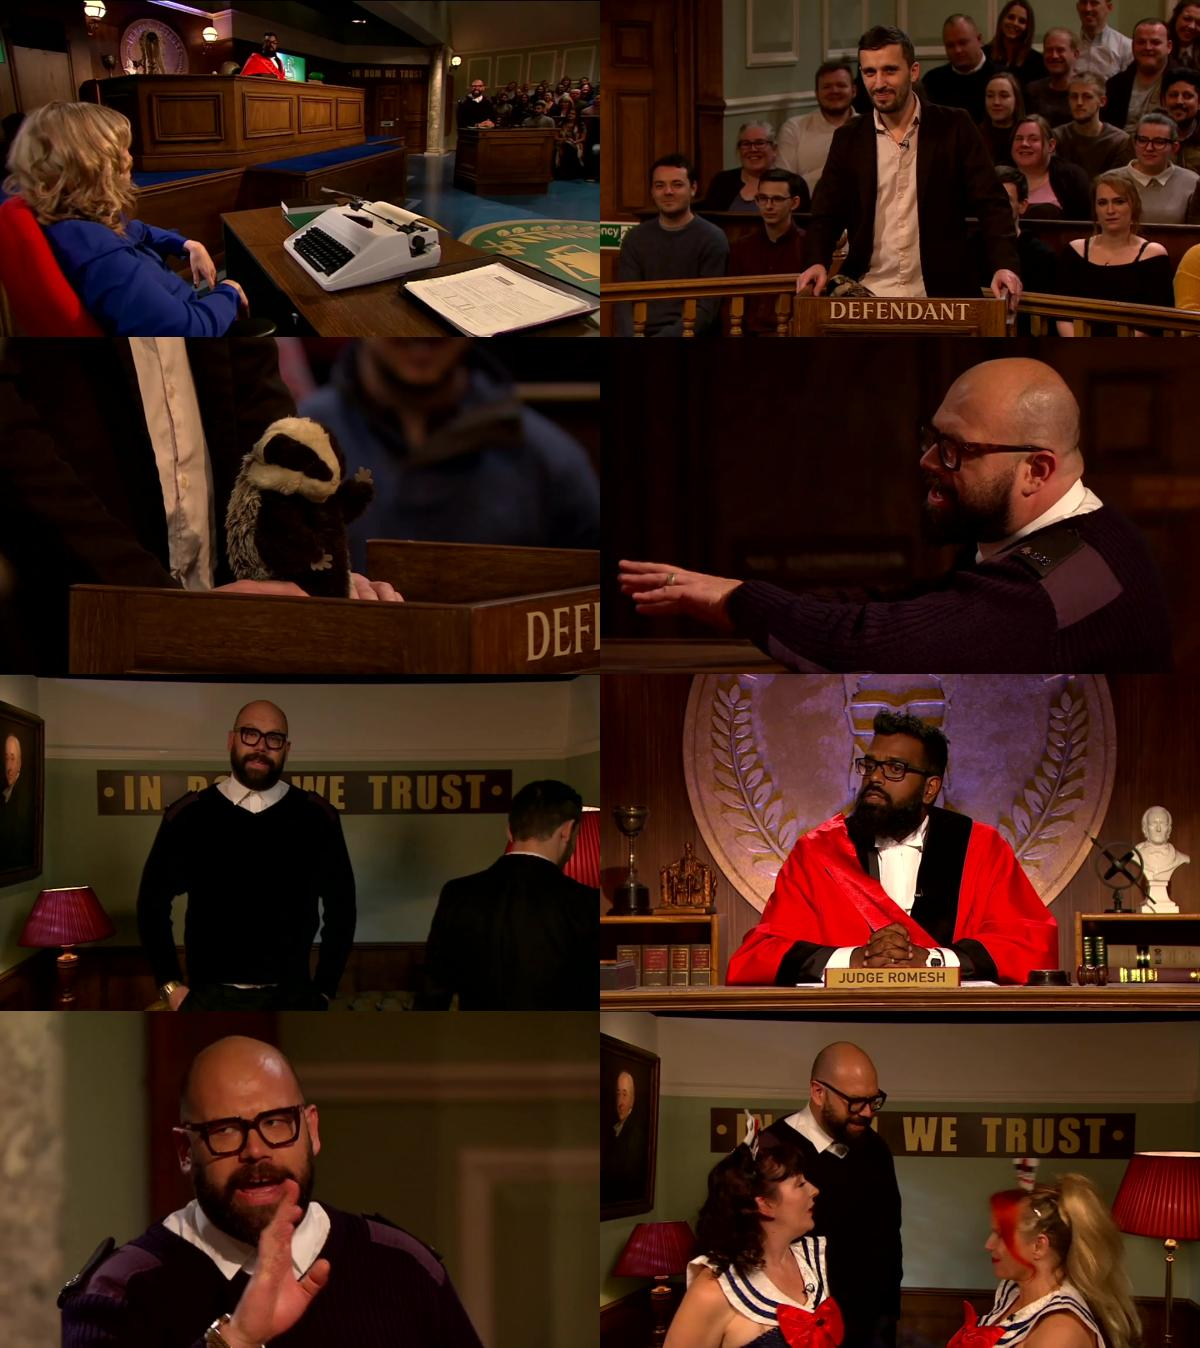 [Bild: 127516032_judge-romesh-s01e10-web-h264-brexit.jpg]